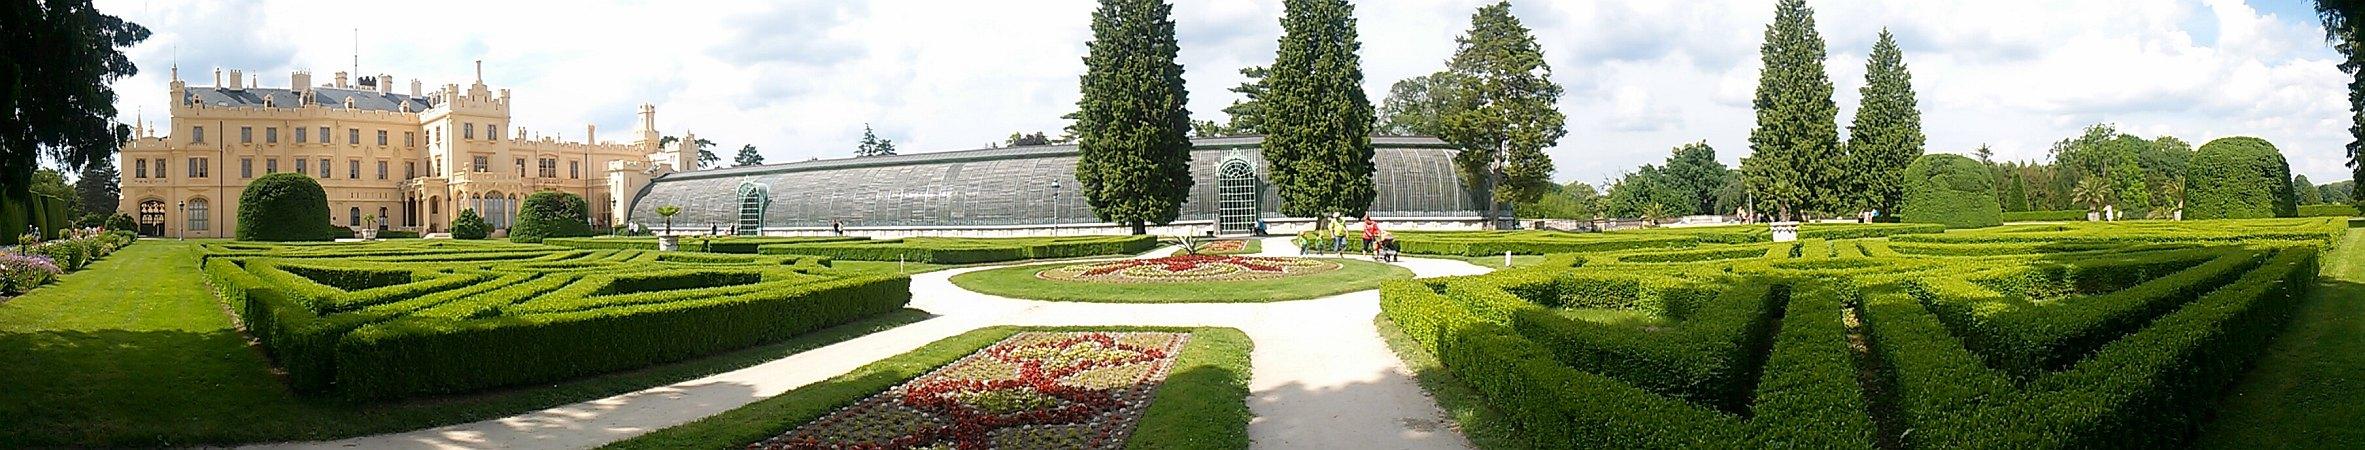 Lednice Schloss Panorama